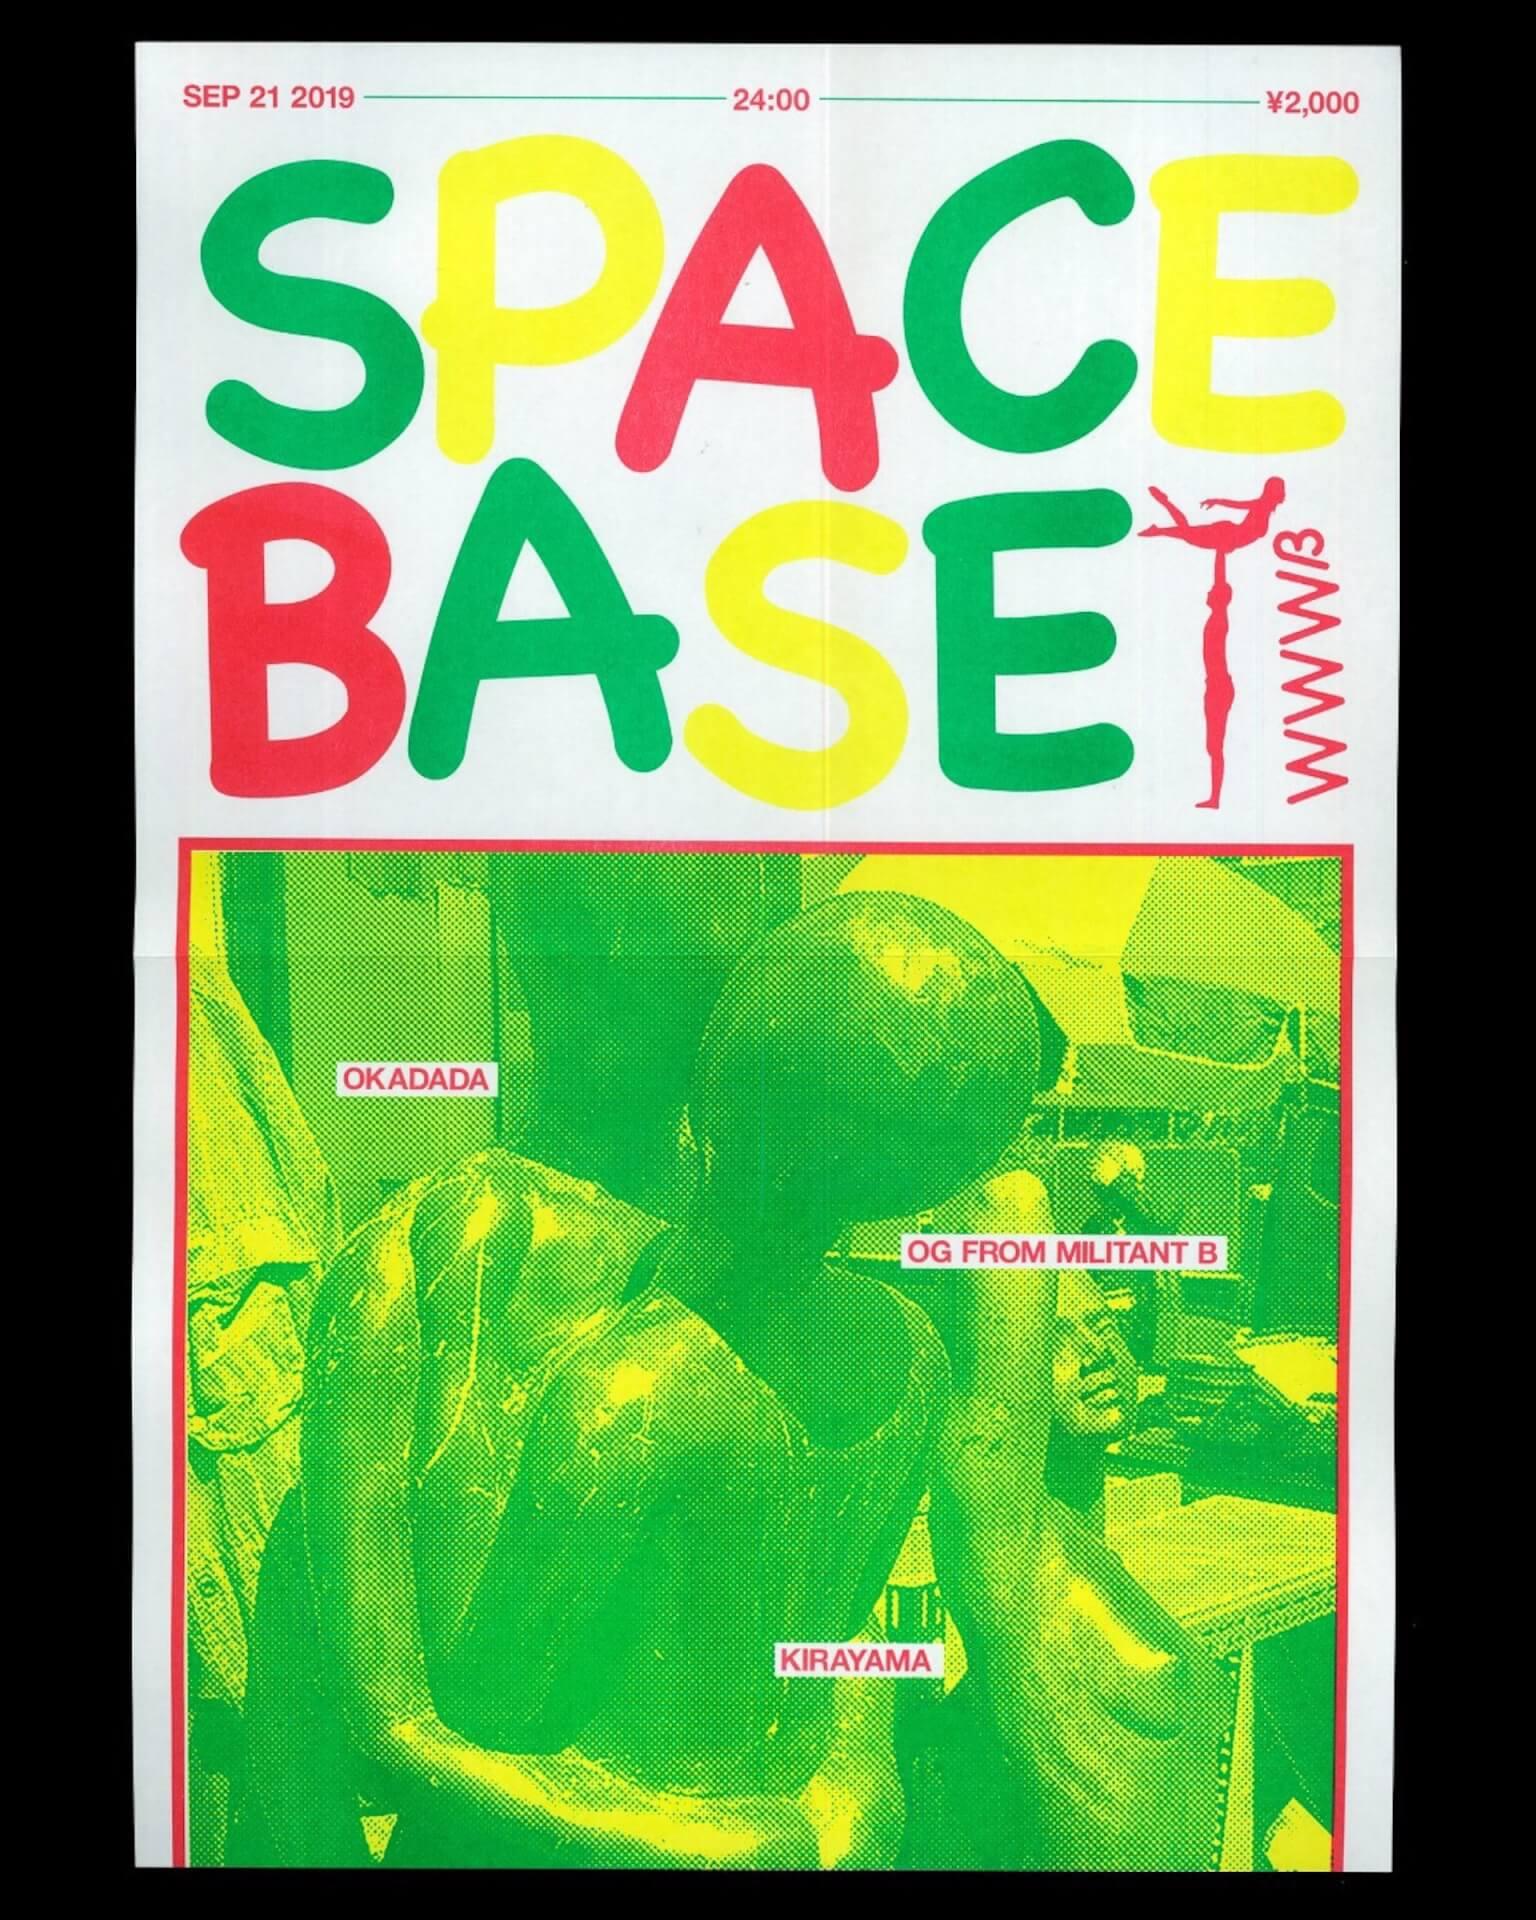 okadada、KIRAYAMA、OG from Militant Bと絶大な信頼を得る86年生のDJ3者が集う<SPACE BASE>第2回が9月にWWWβで開催 music190828-spacebase-4